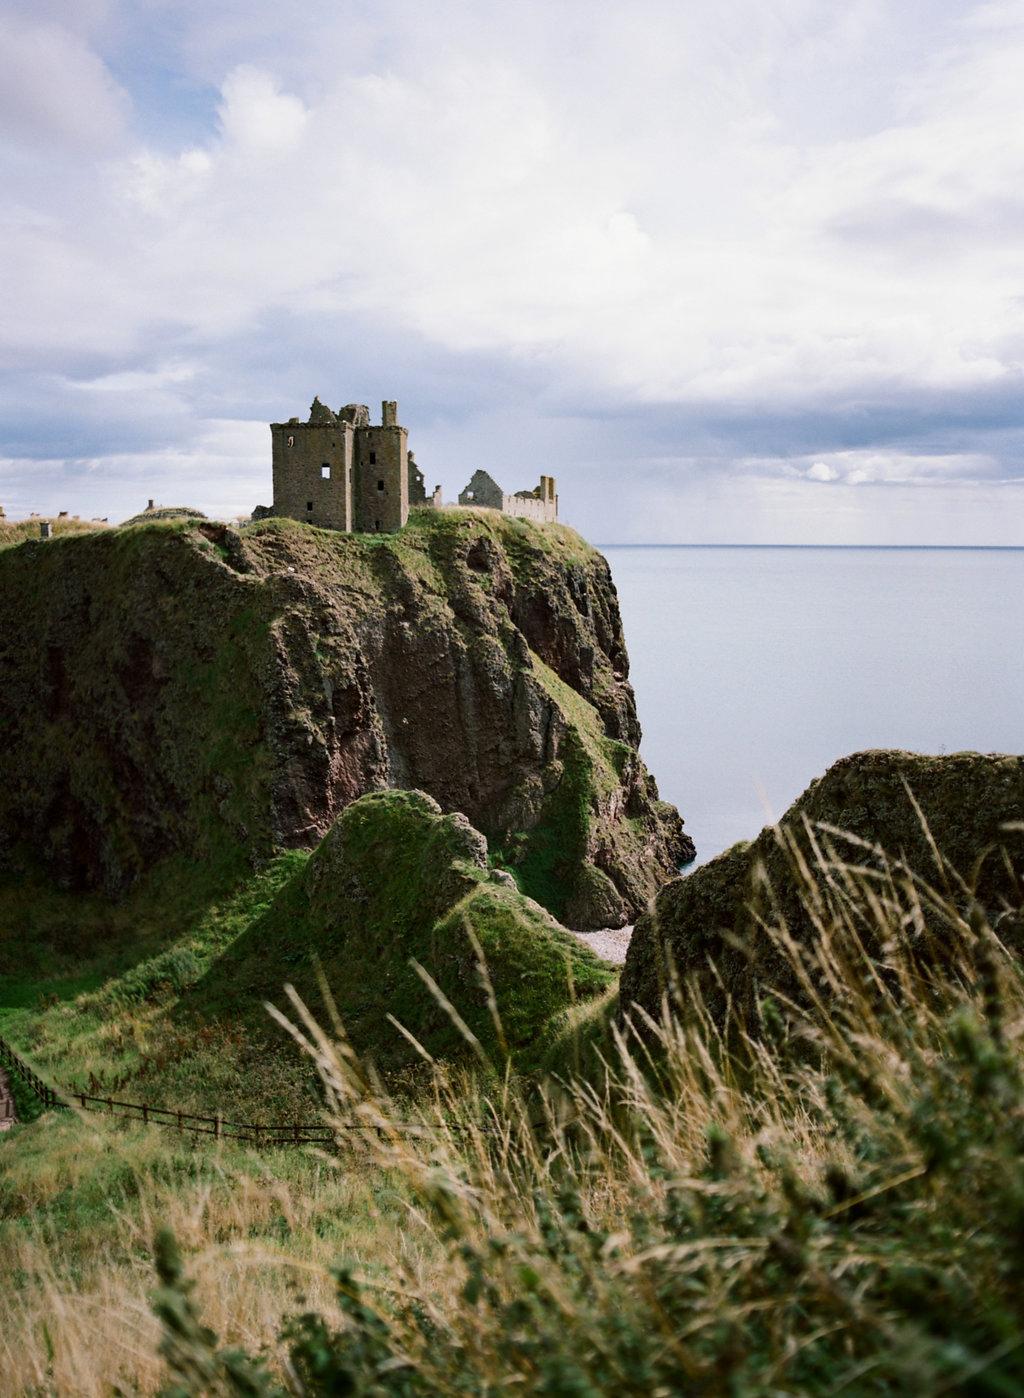 Scotland-Prewedding-highlands-castle-Engagment-Photos-Katie-Grant (80 of 139).jpg